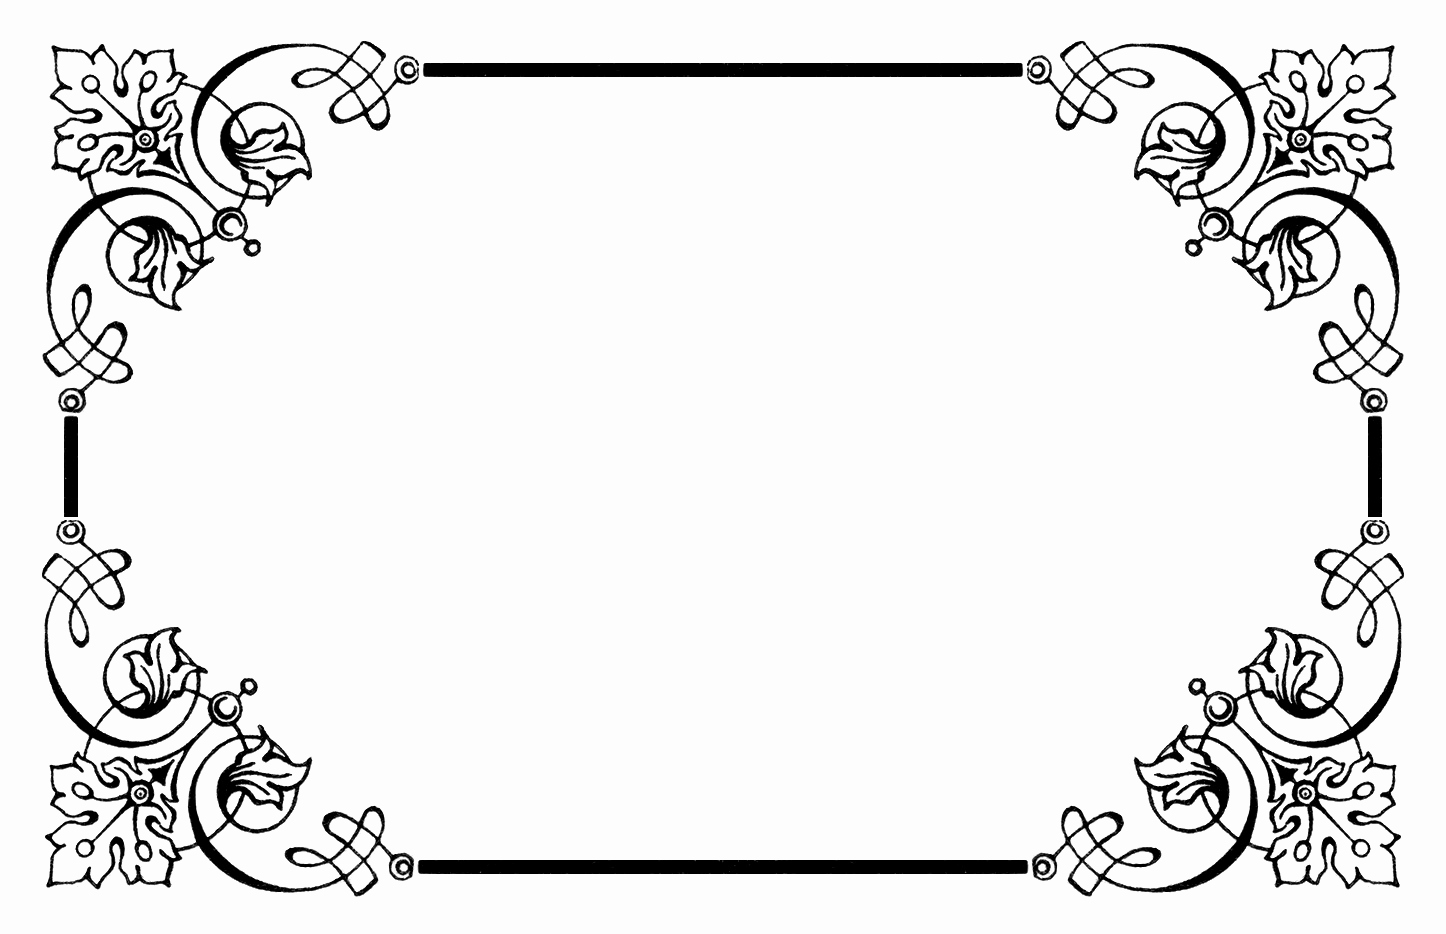 Wedding Invitation Borders Design Inspirational Free Wedding Page Border Download Free Clip Art Free